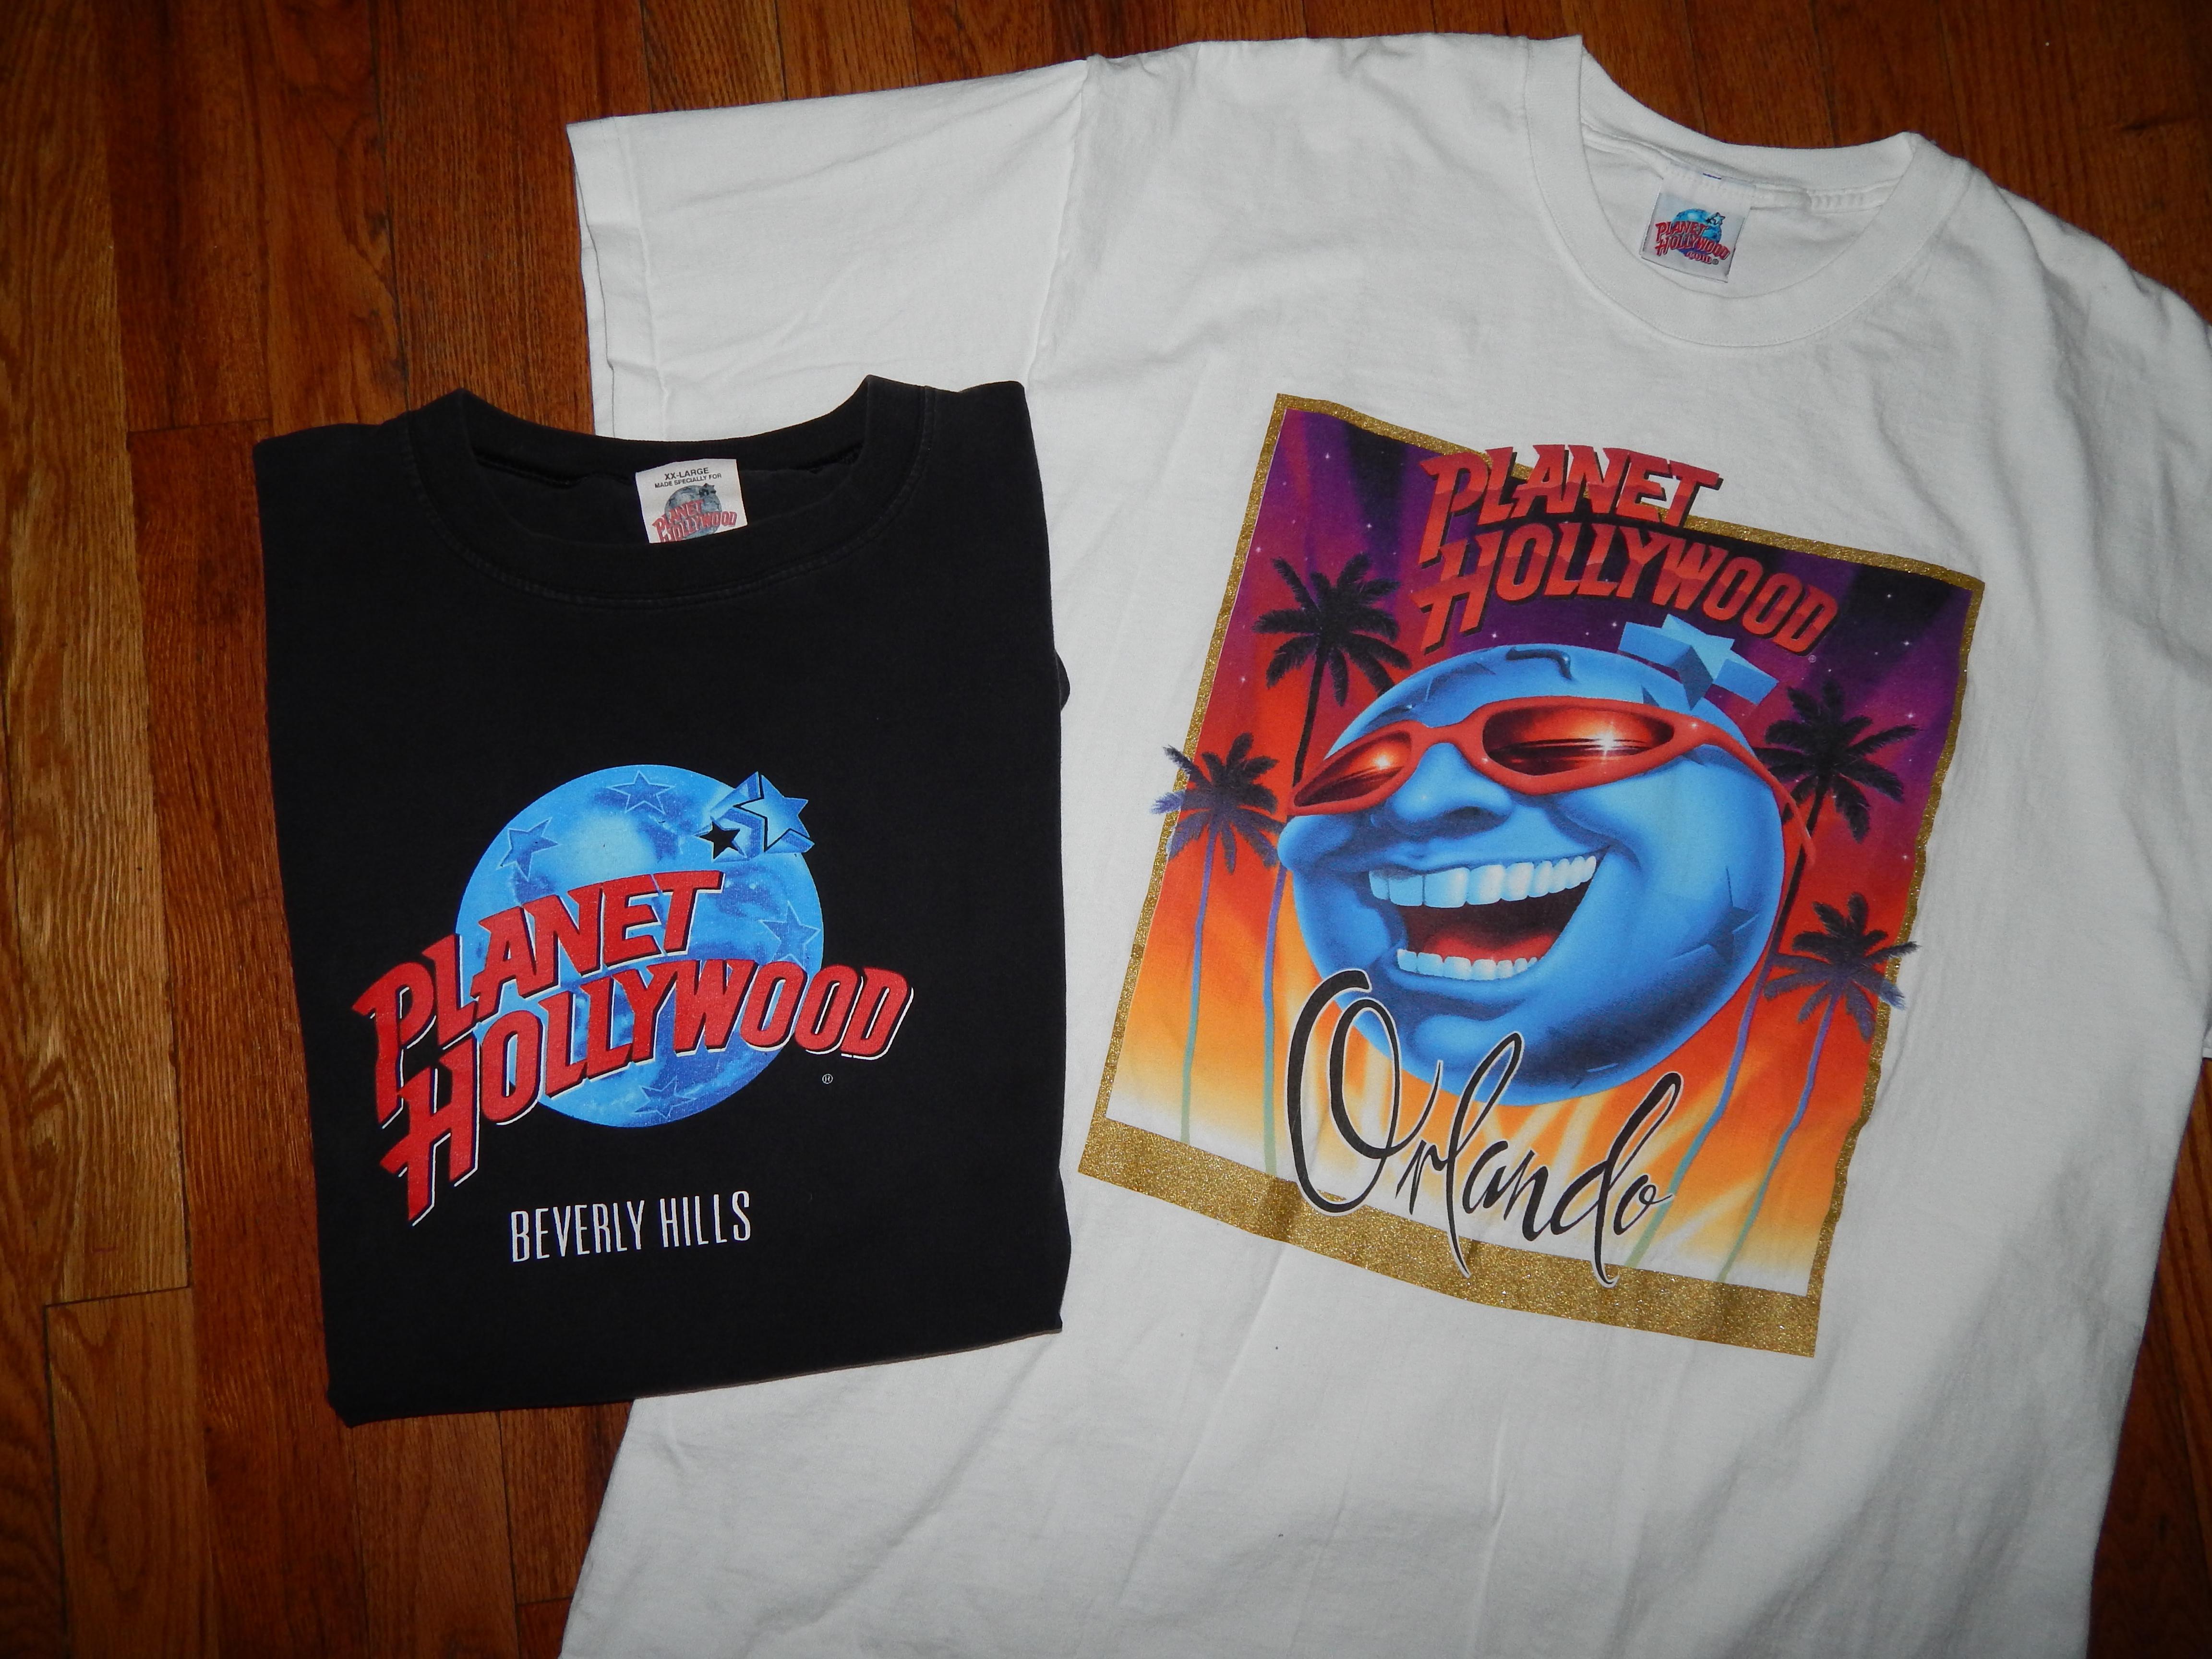 314988d3a15b Vintage × Planet Hollywood ×. VTG Planet Hollywood T-shirt Bundle